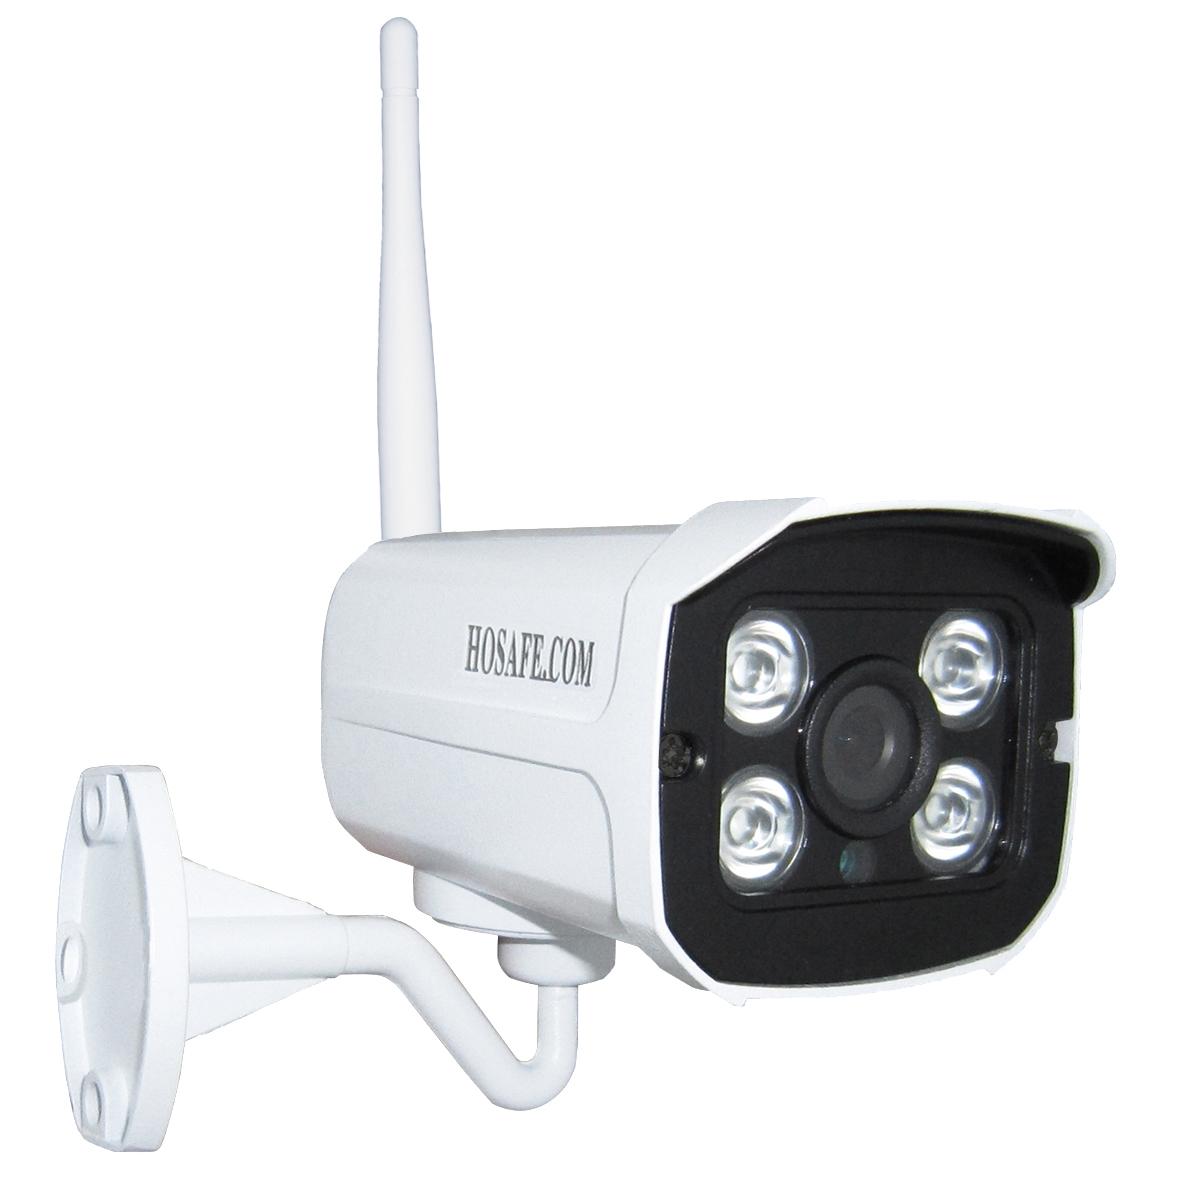 HOSAFECOM Стандарт Англии hosafe sv1mb1w 720p wireless outdoor hd ip camera w h 264 motion detection e mail alert ip66 4 led ir night vision